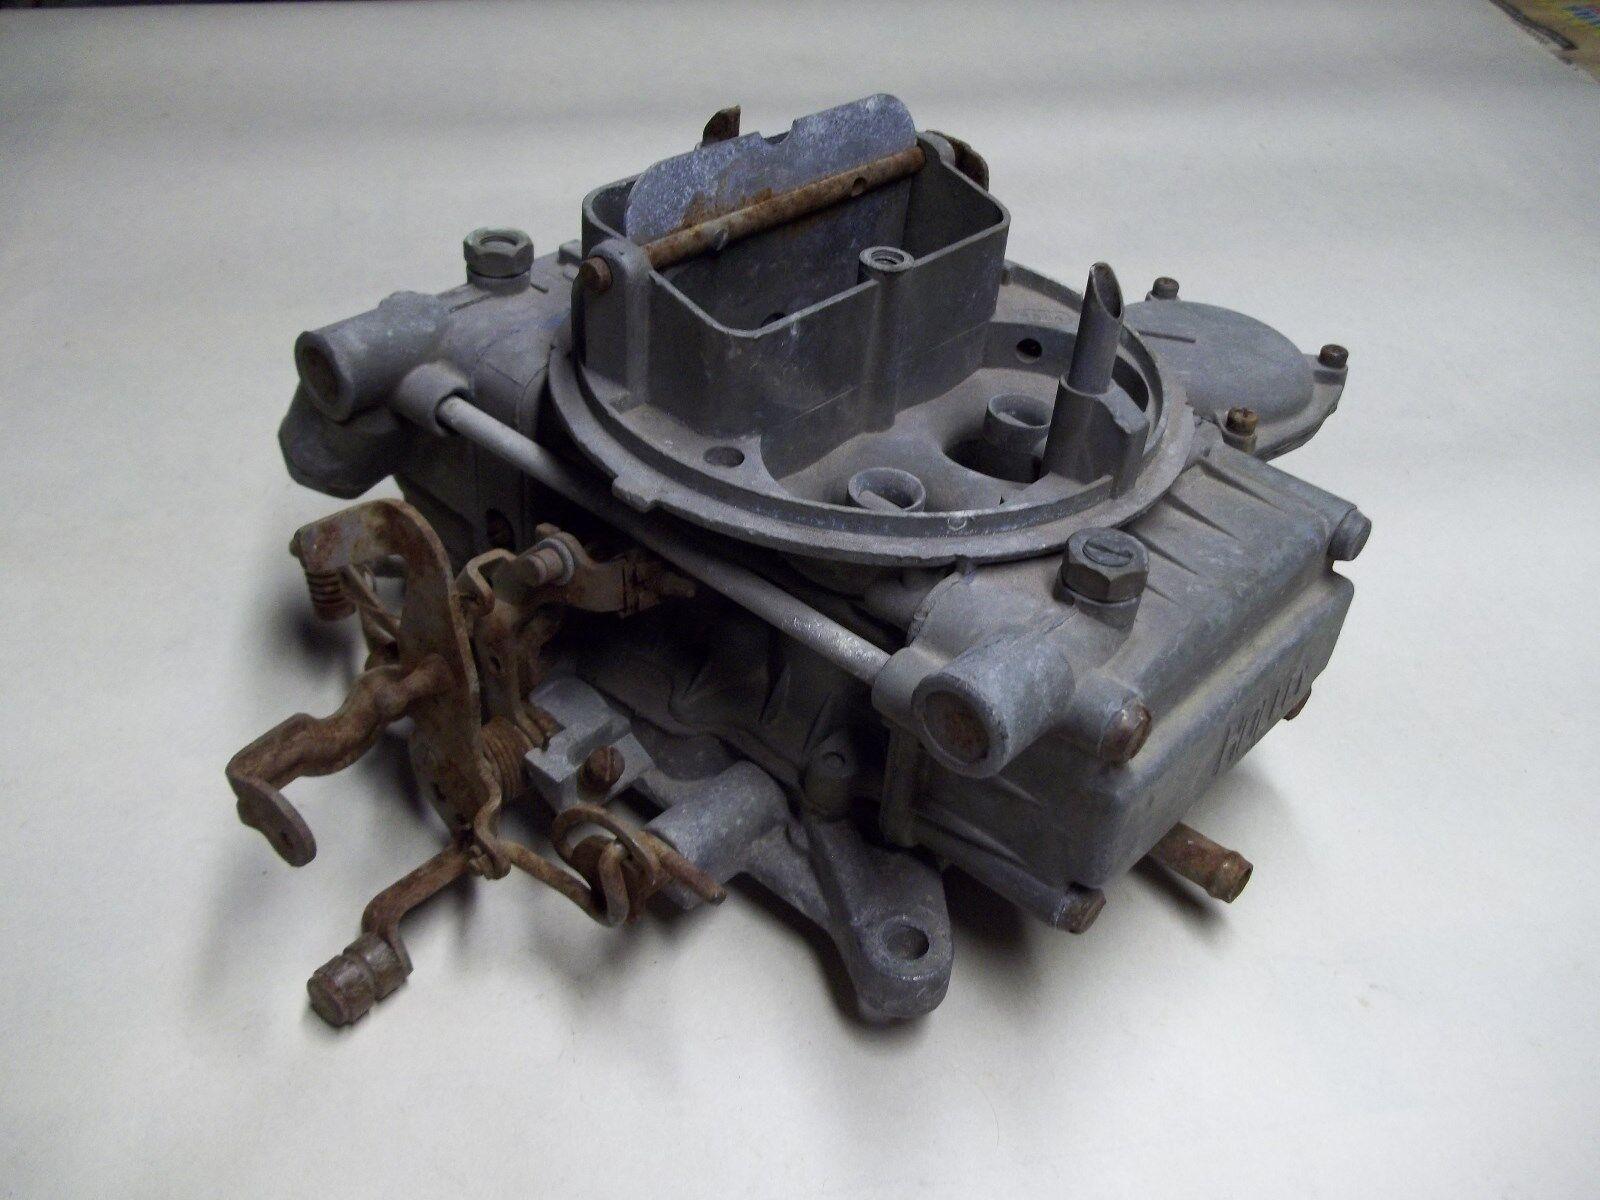 Holley 4 barrel carburetor for parts List 6830 Ford number D4TE-9510-ASA